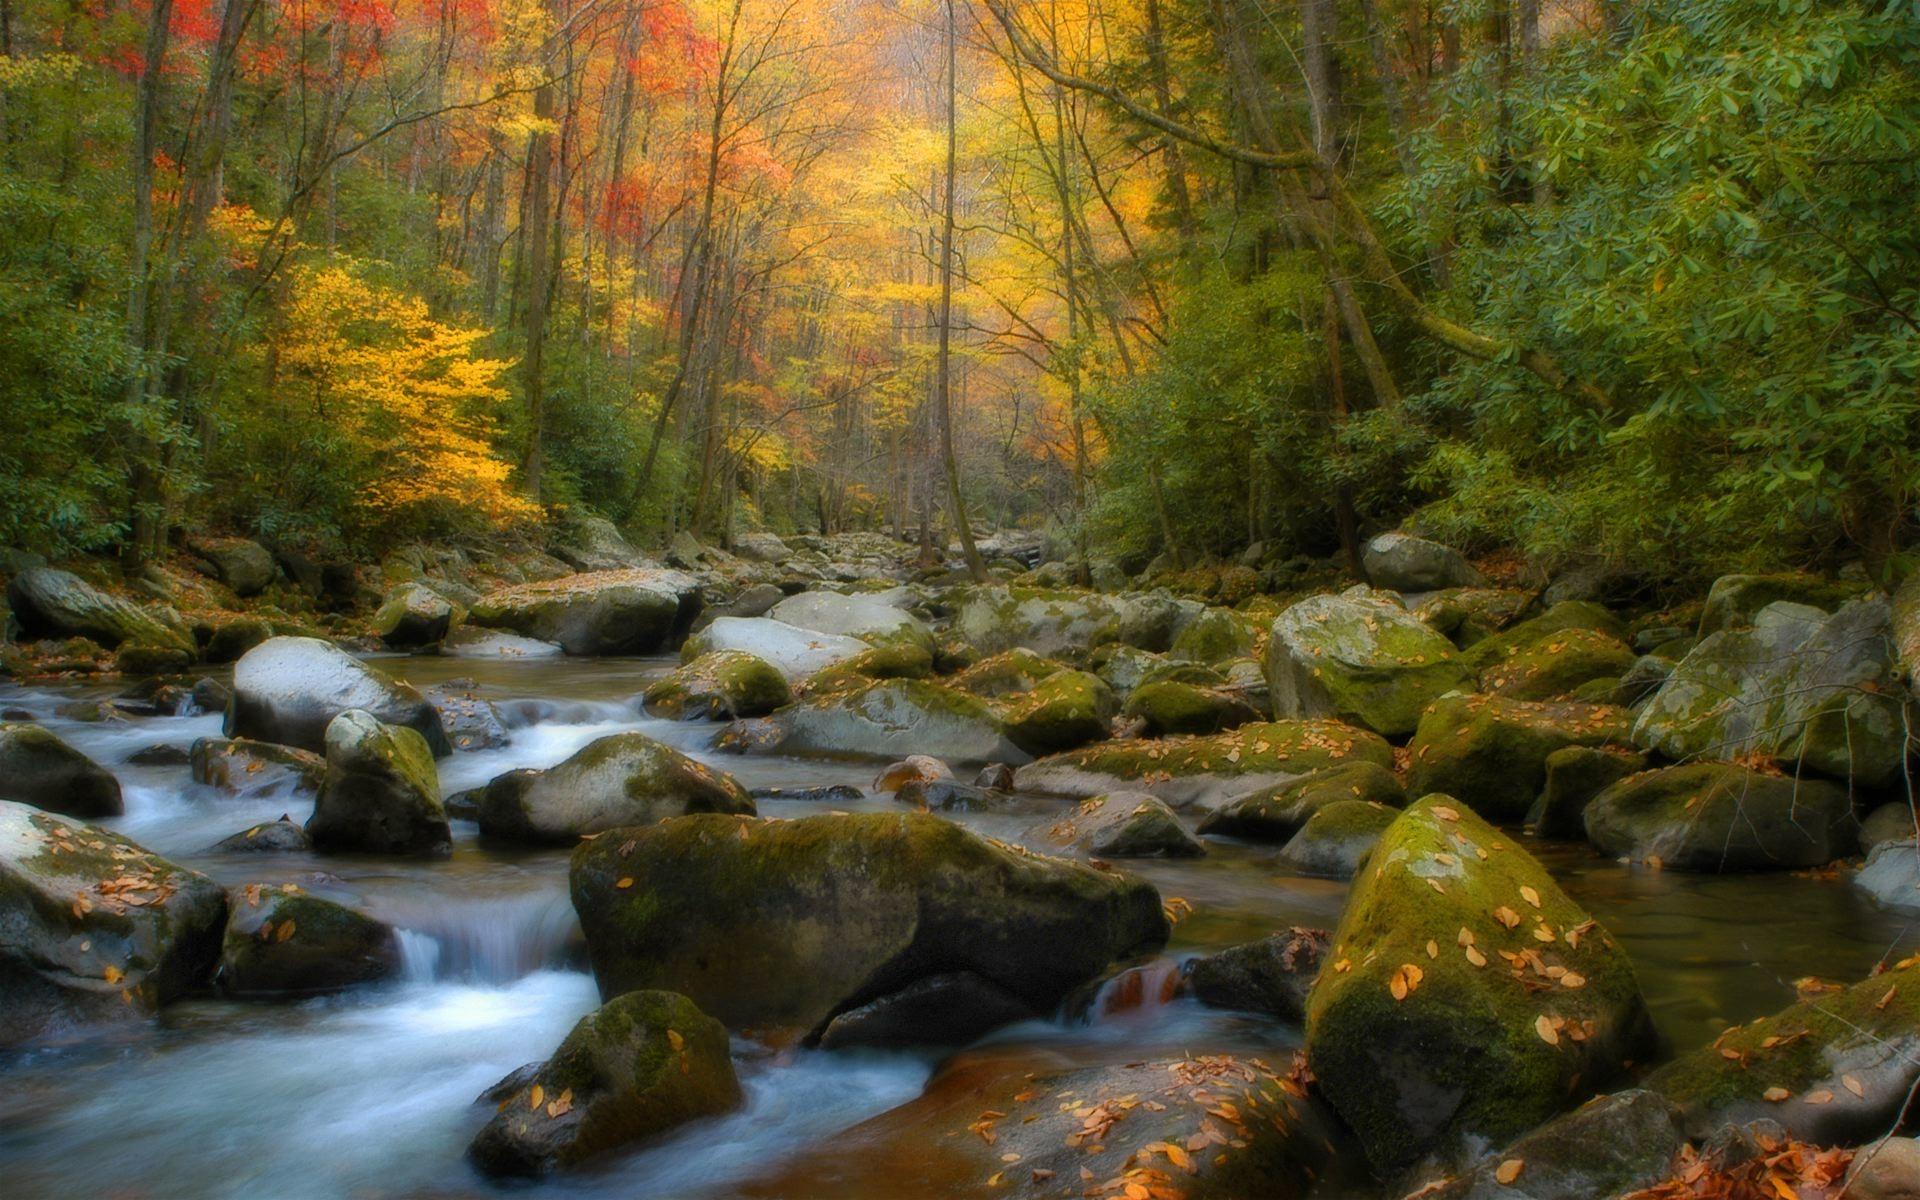 Autumn Country Side desktop wallpaper